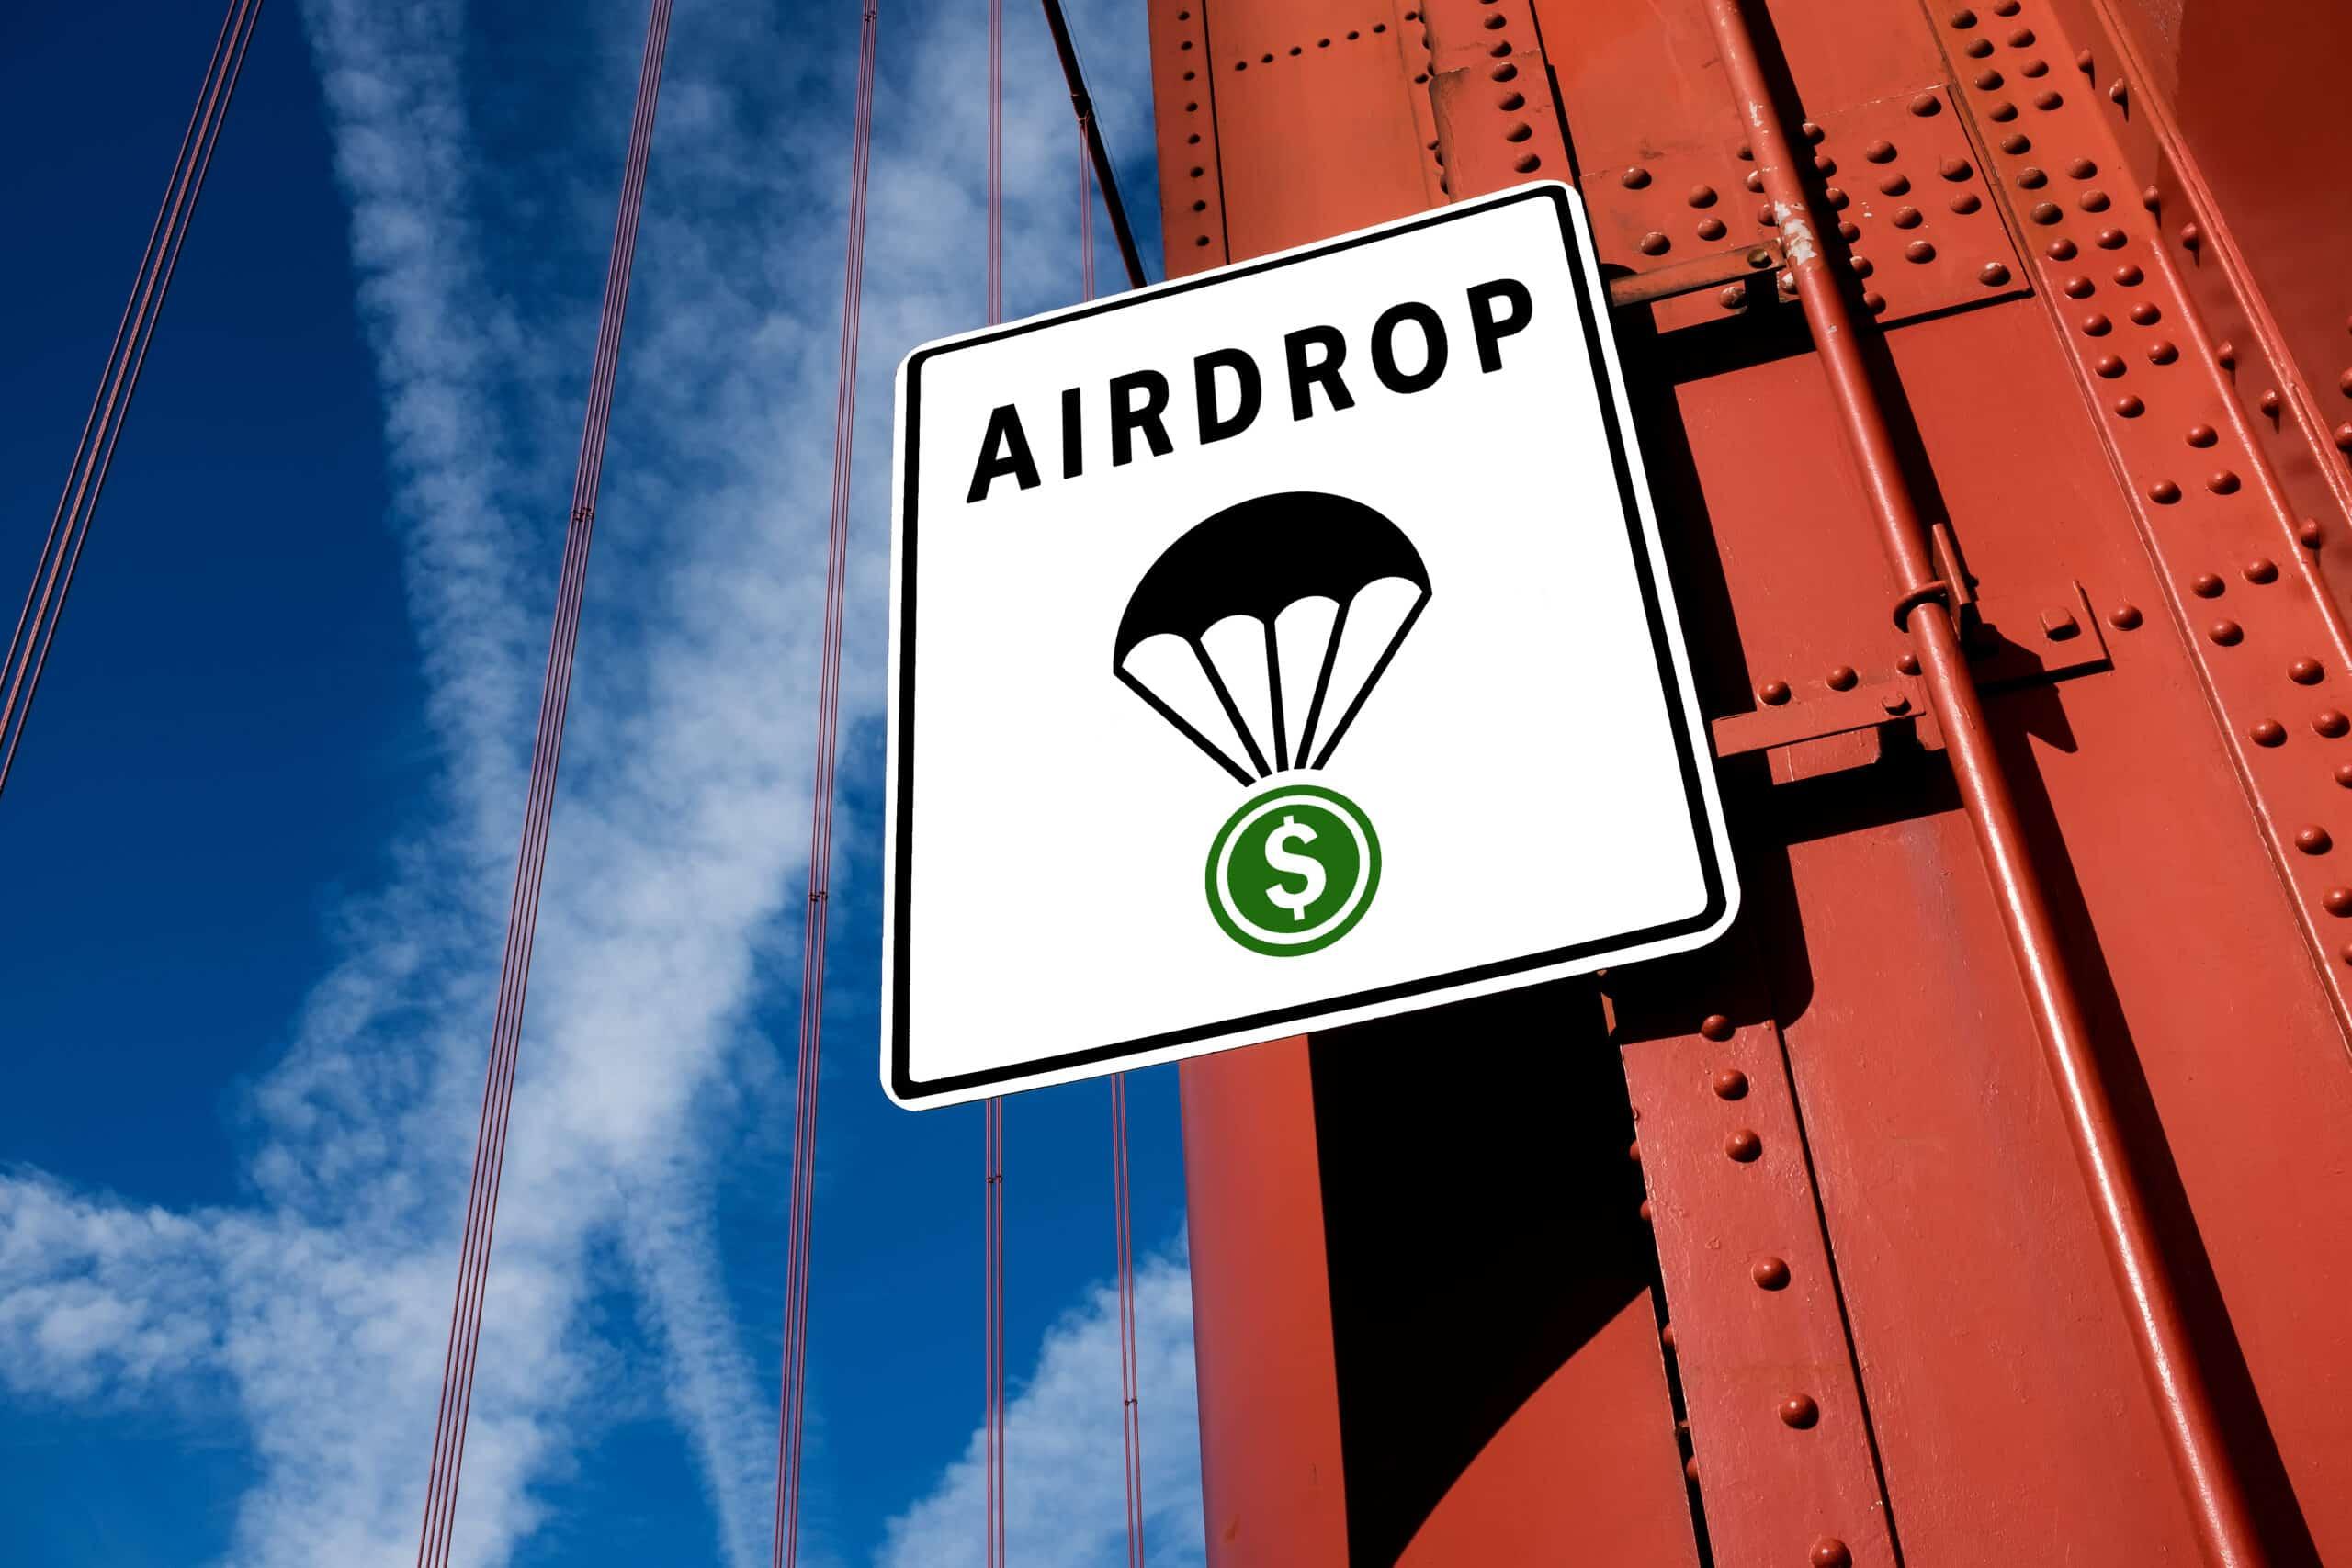 Airdrop Symbol